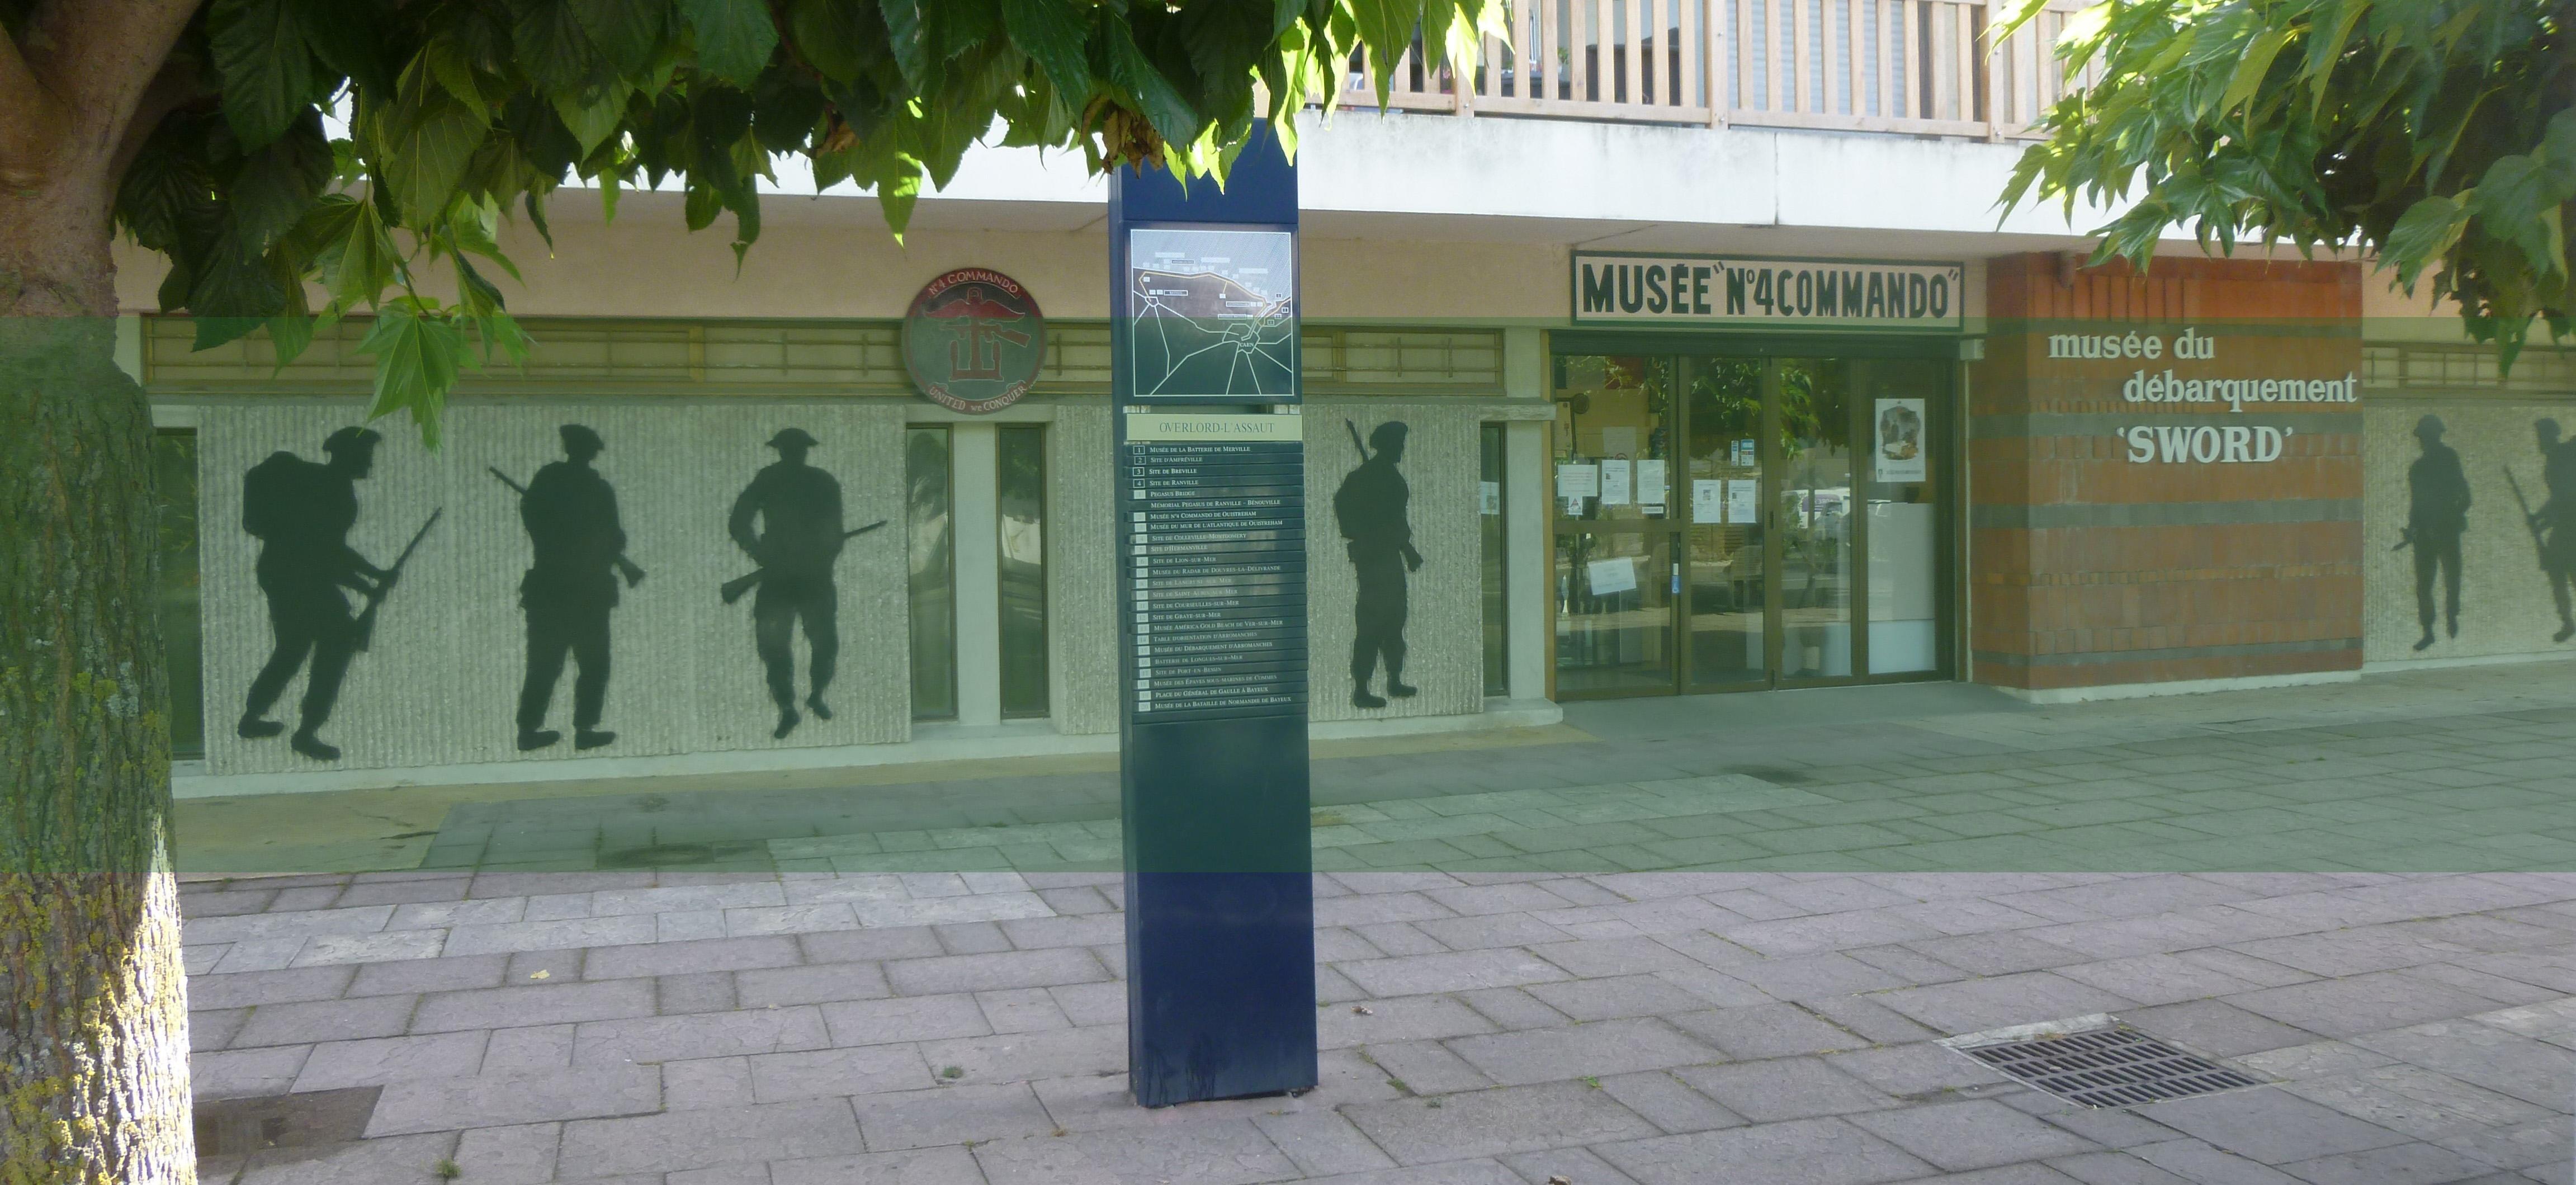 Musée n°4 Commando